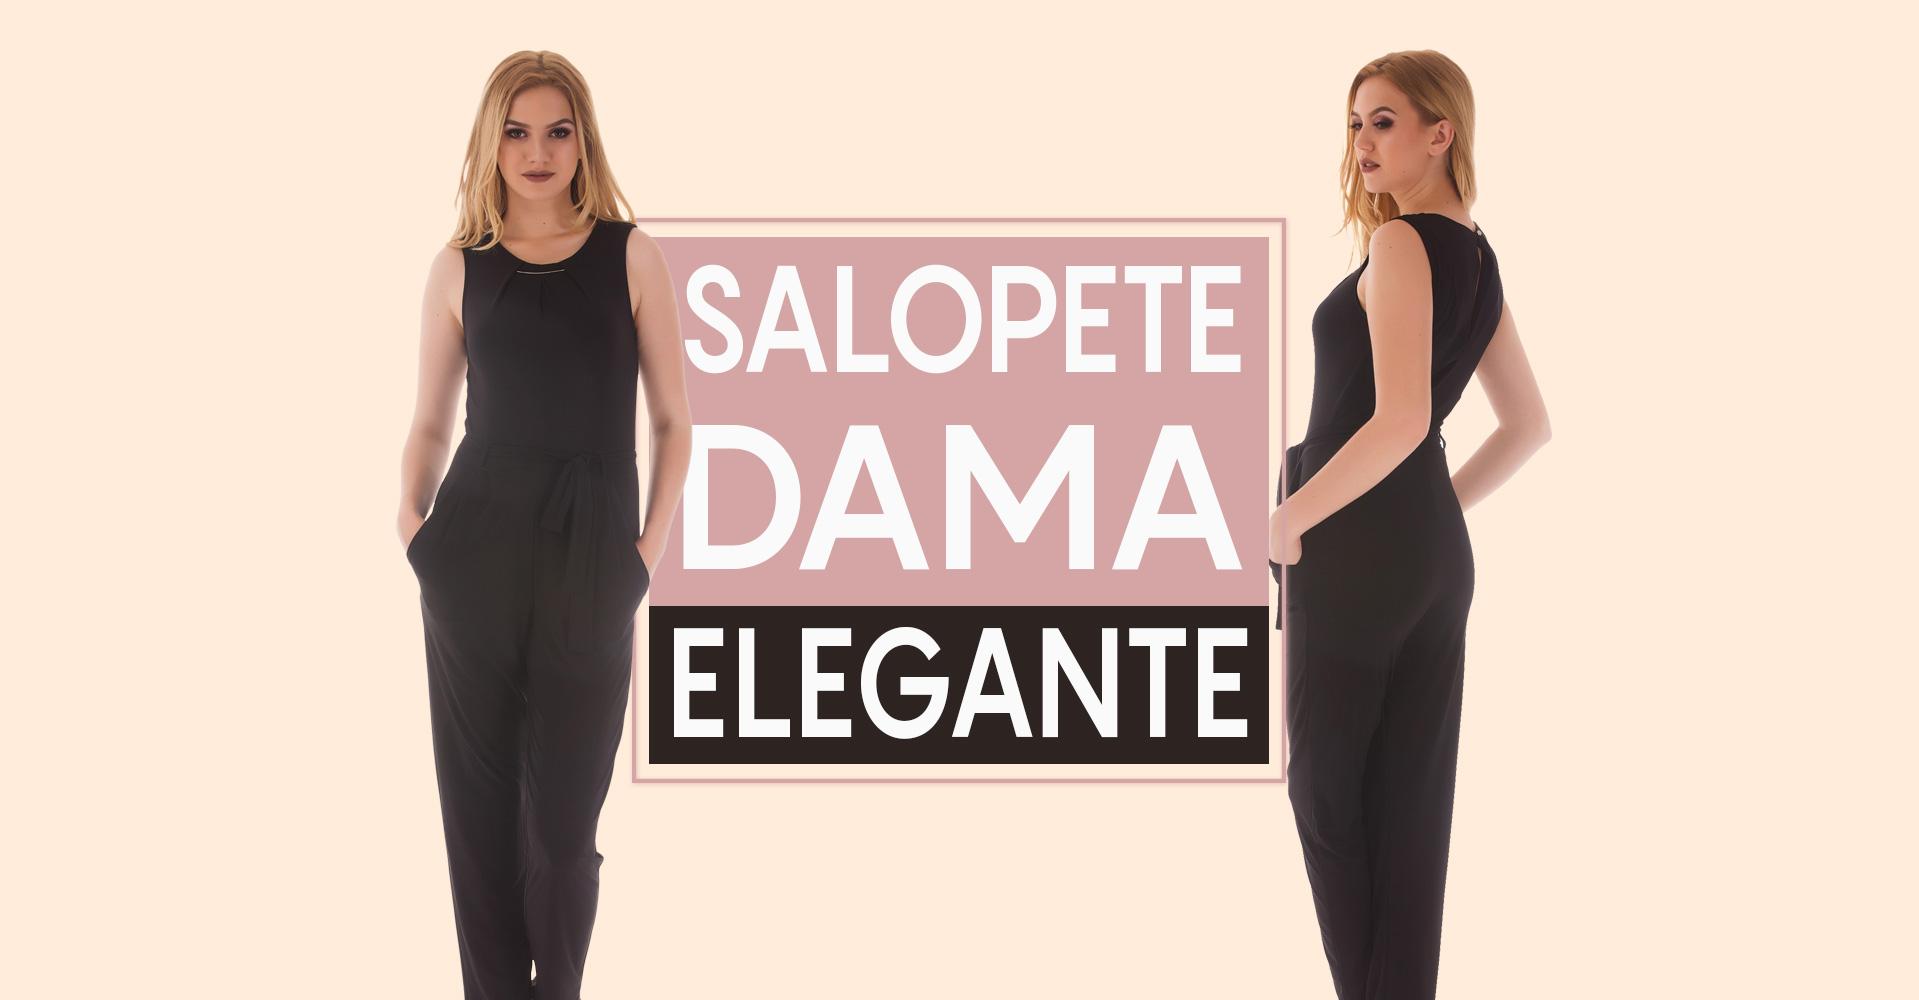 Salopete